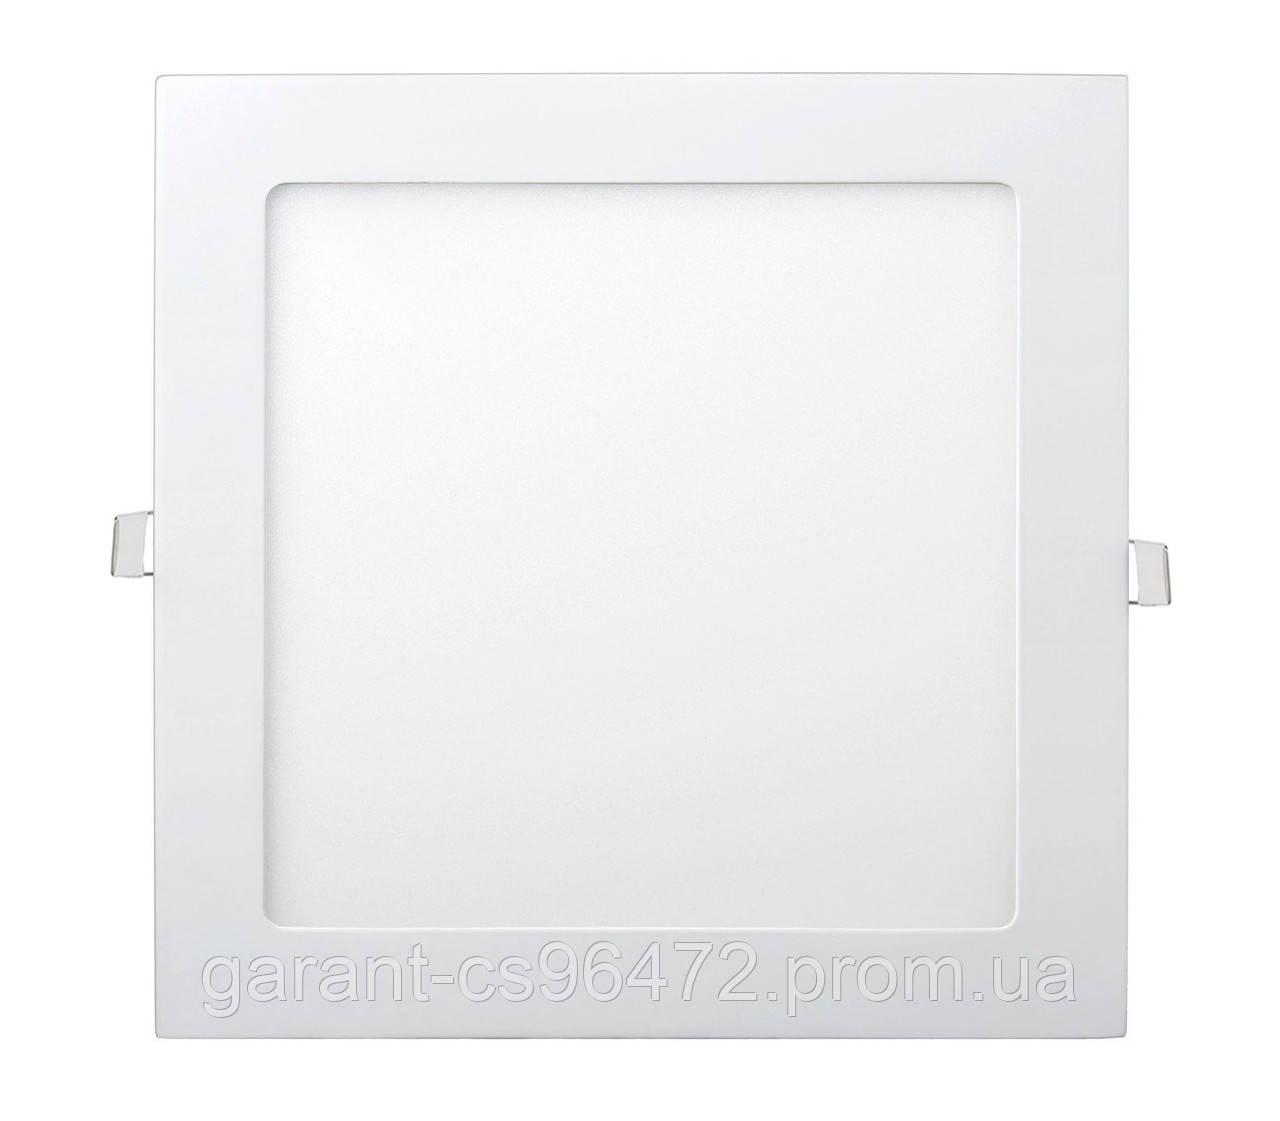 Светильник врезной LED Square Downlight 18W-220V-1300L-4000K Alum TNSy